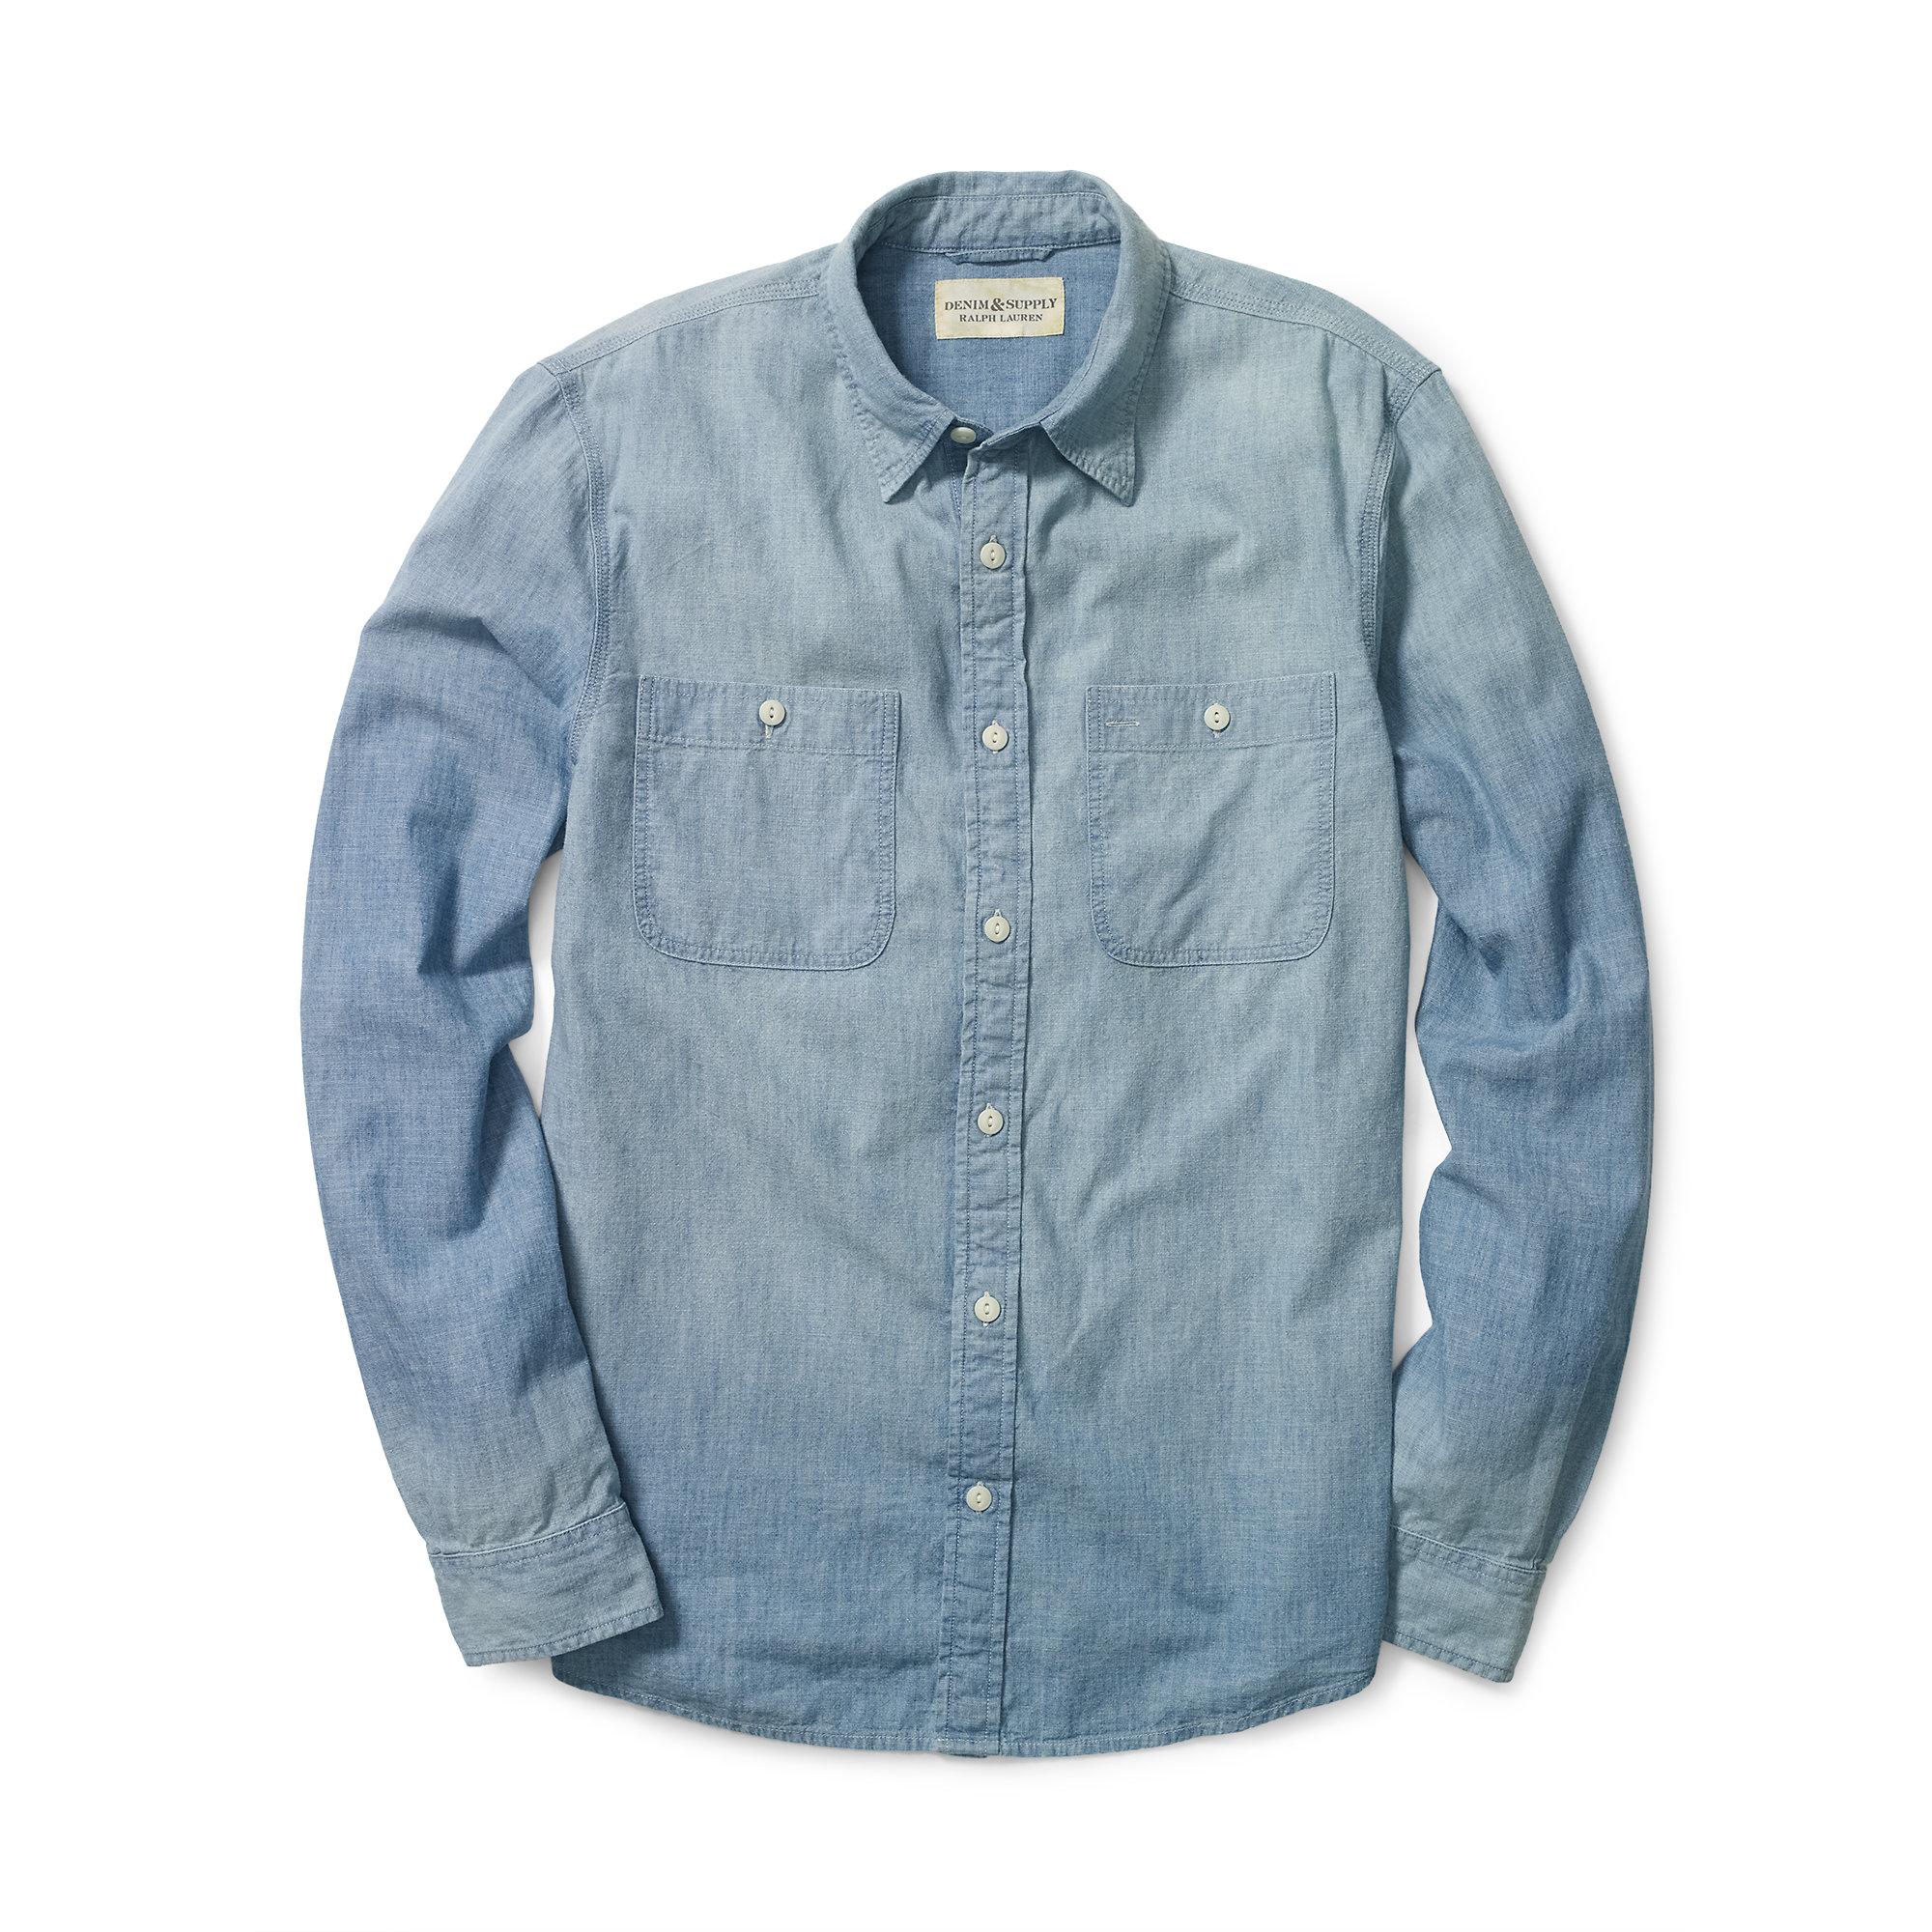 9fc33c08a2 Lyst - Denim   Supply Ralph Lauren Cotton Chambray Shirt in Blue for Men